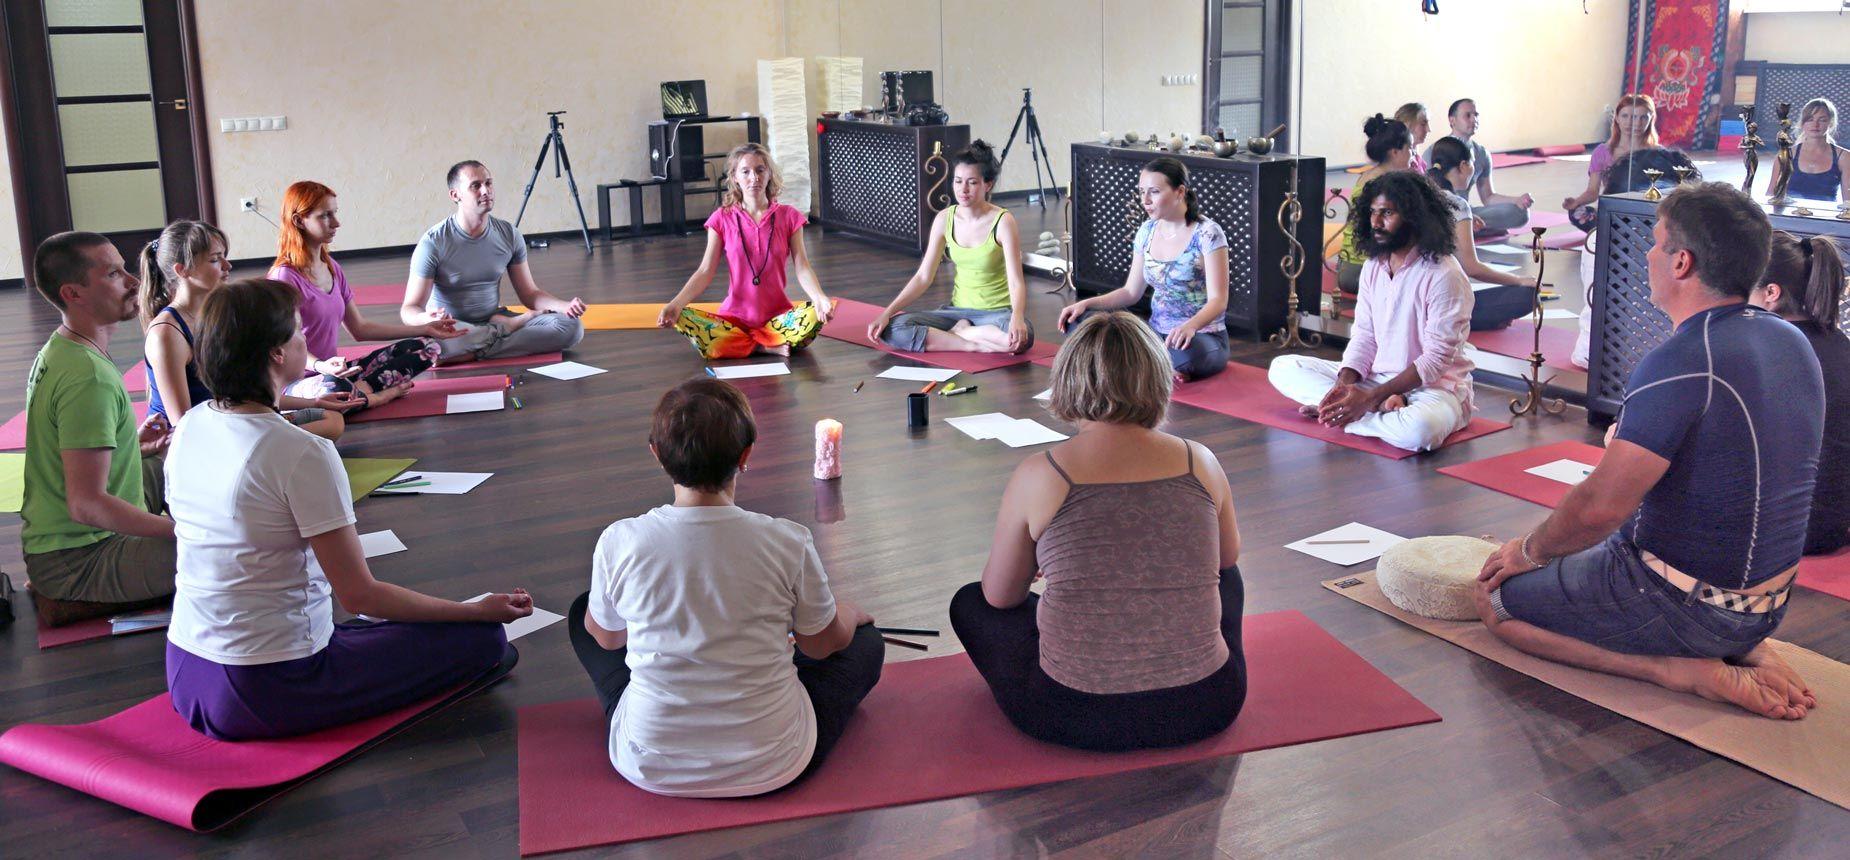 Best Yoga Teacher Training Program In Thailand 2019 Yoga Teacher Training Yoga Teacher Training Course Yoga Courses